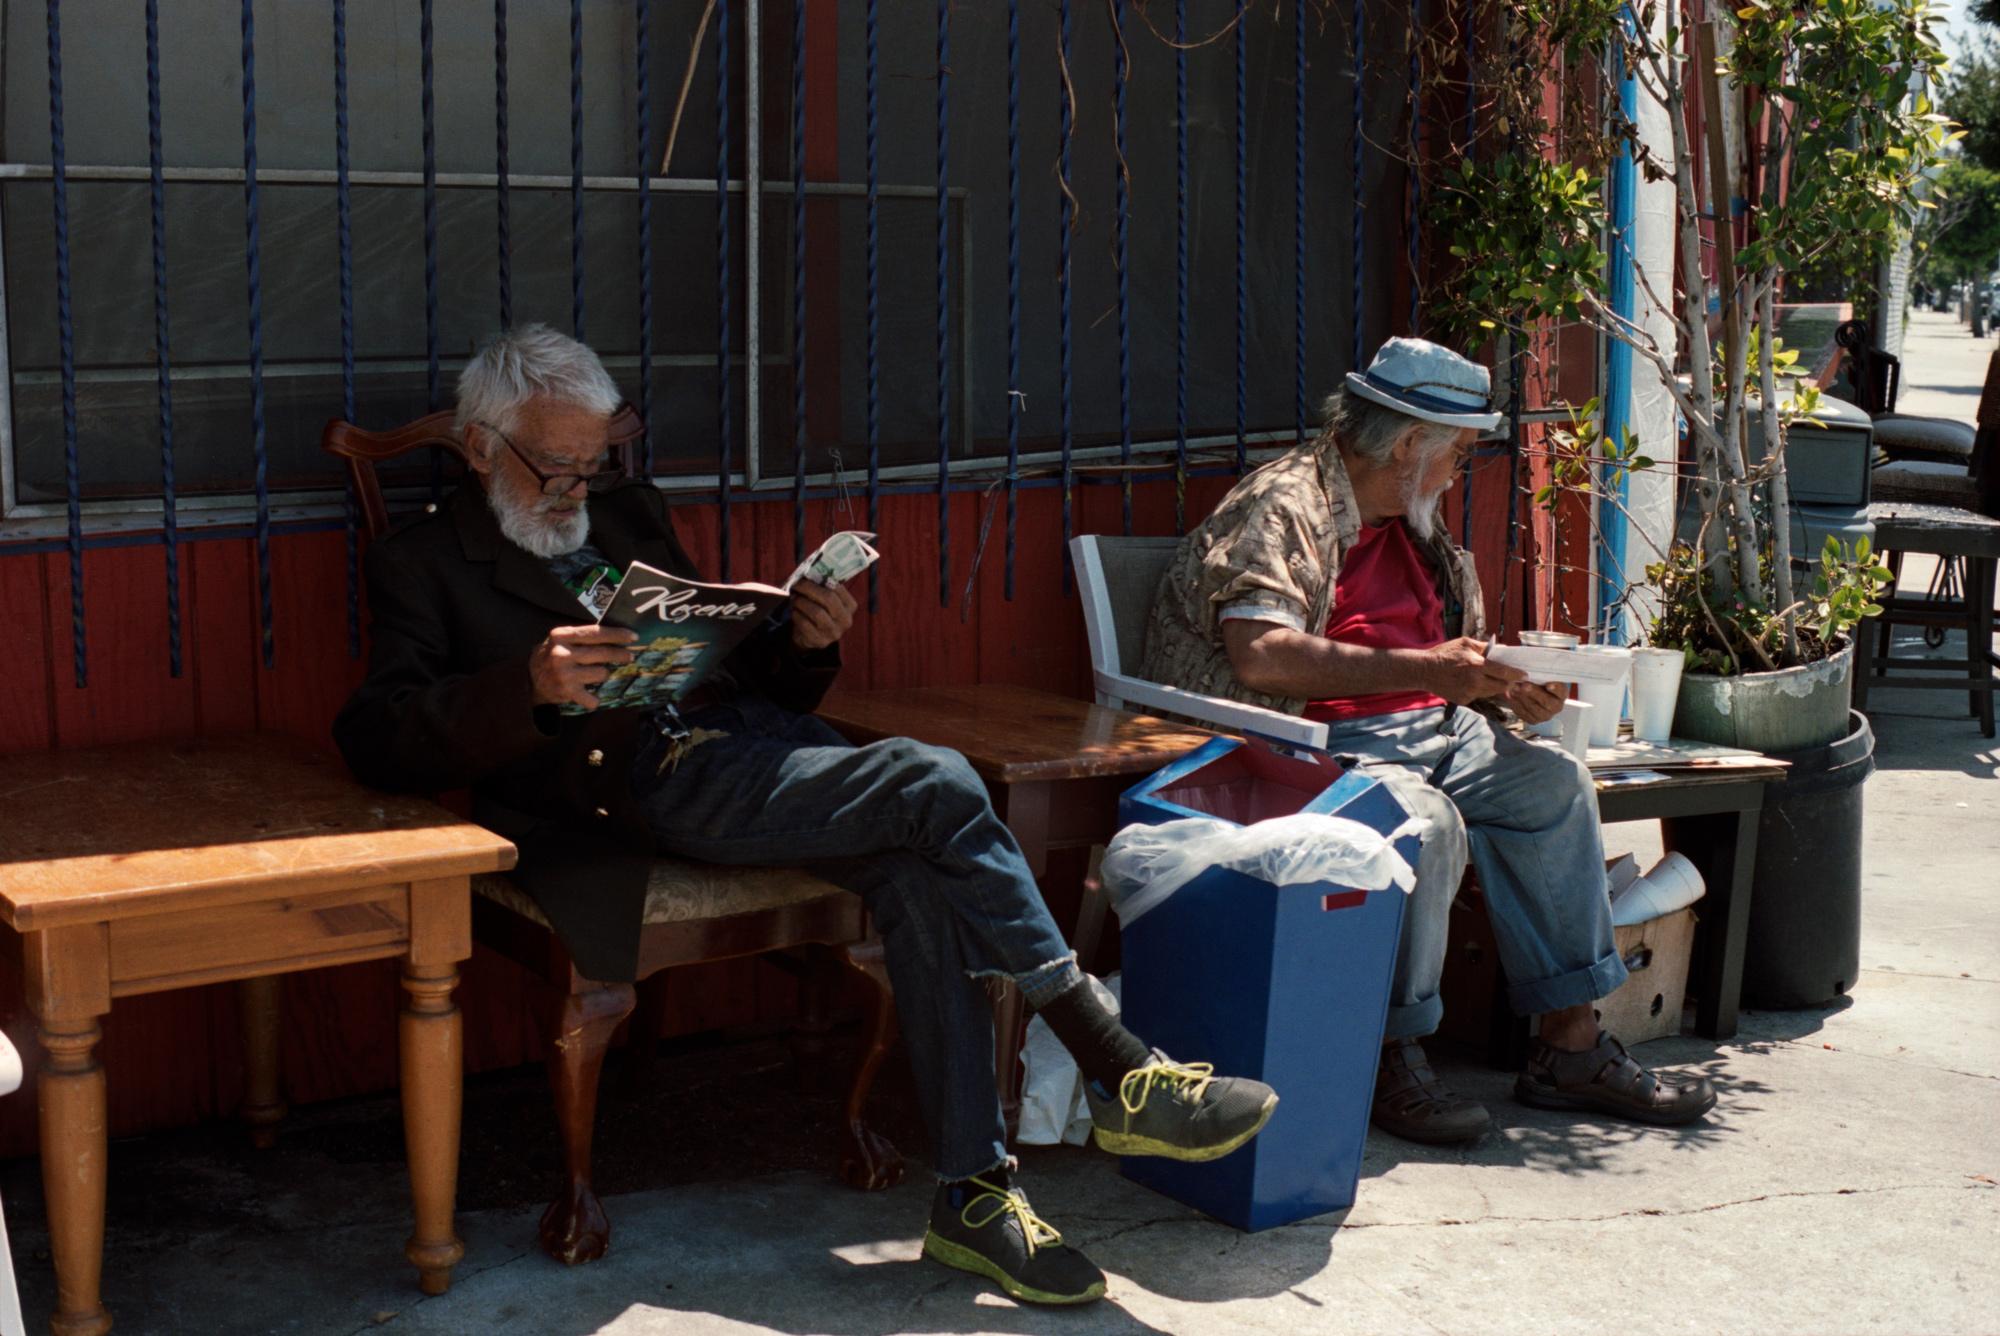 Two strangers reading, Fairfax Avenue, LA. Omg Your English, photography by Ioannis Koussertari